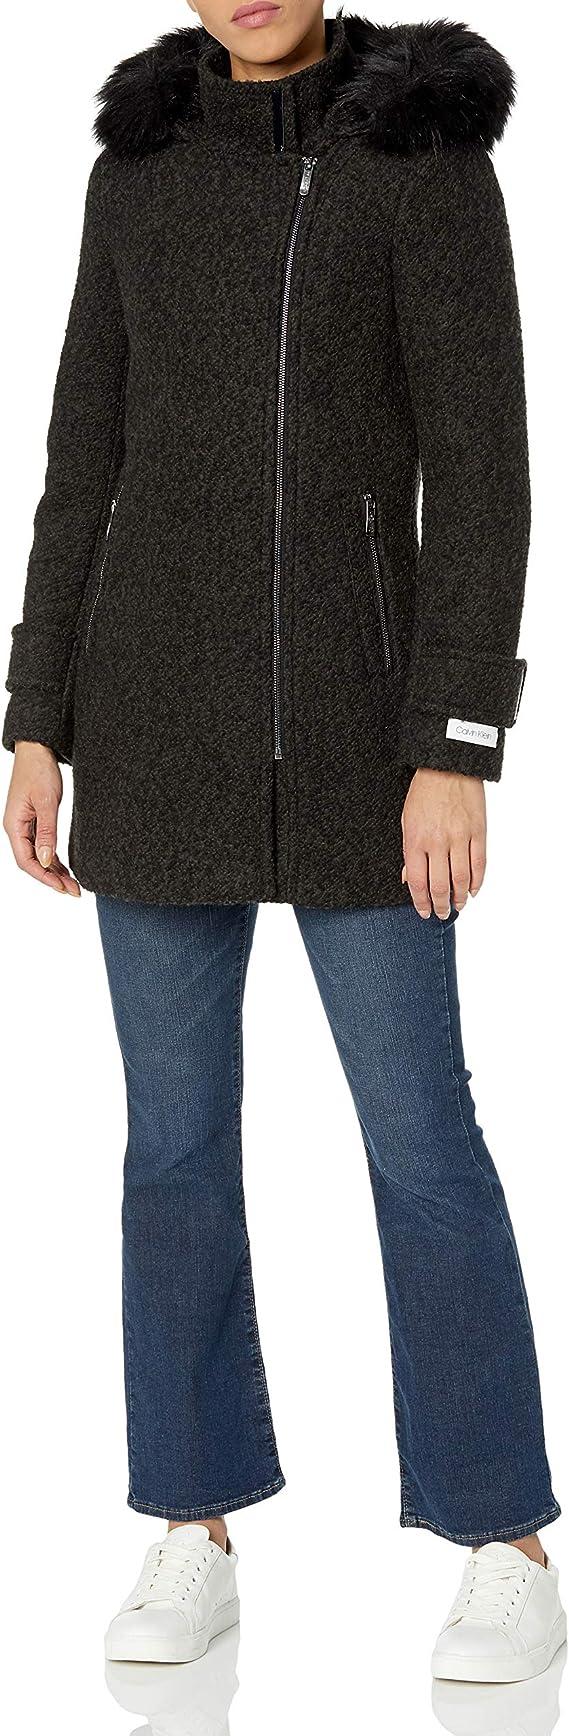 Calvin Klein 卡尔文克莱因 CK 女式连帽羊毛呢大衣外套 1.6折$32.49起 海淘转运到手约¥327